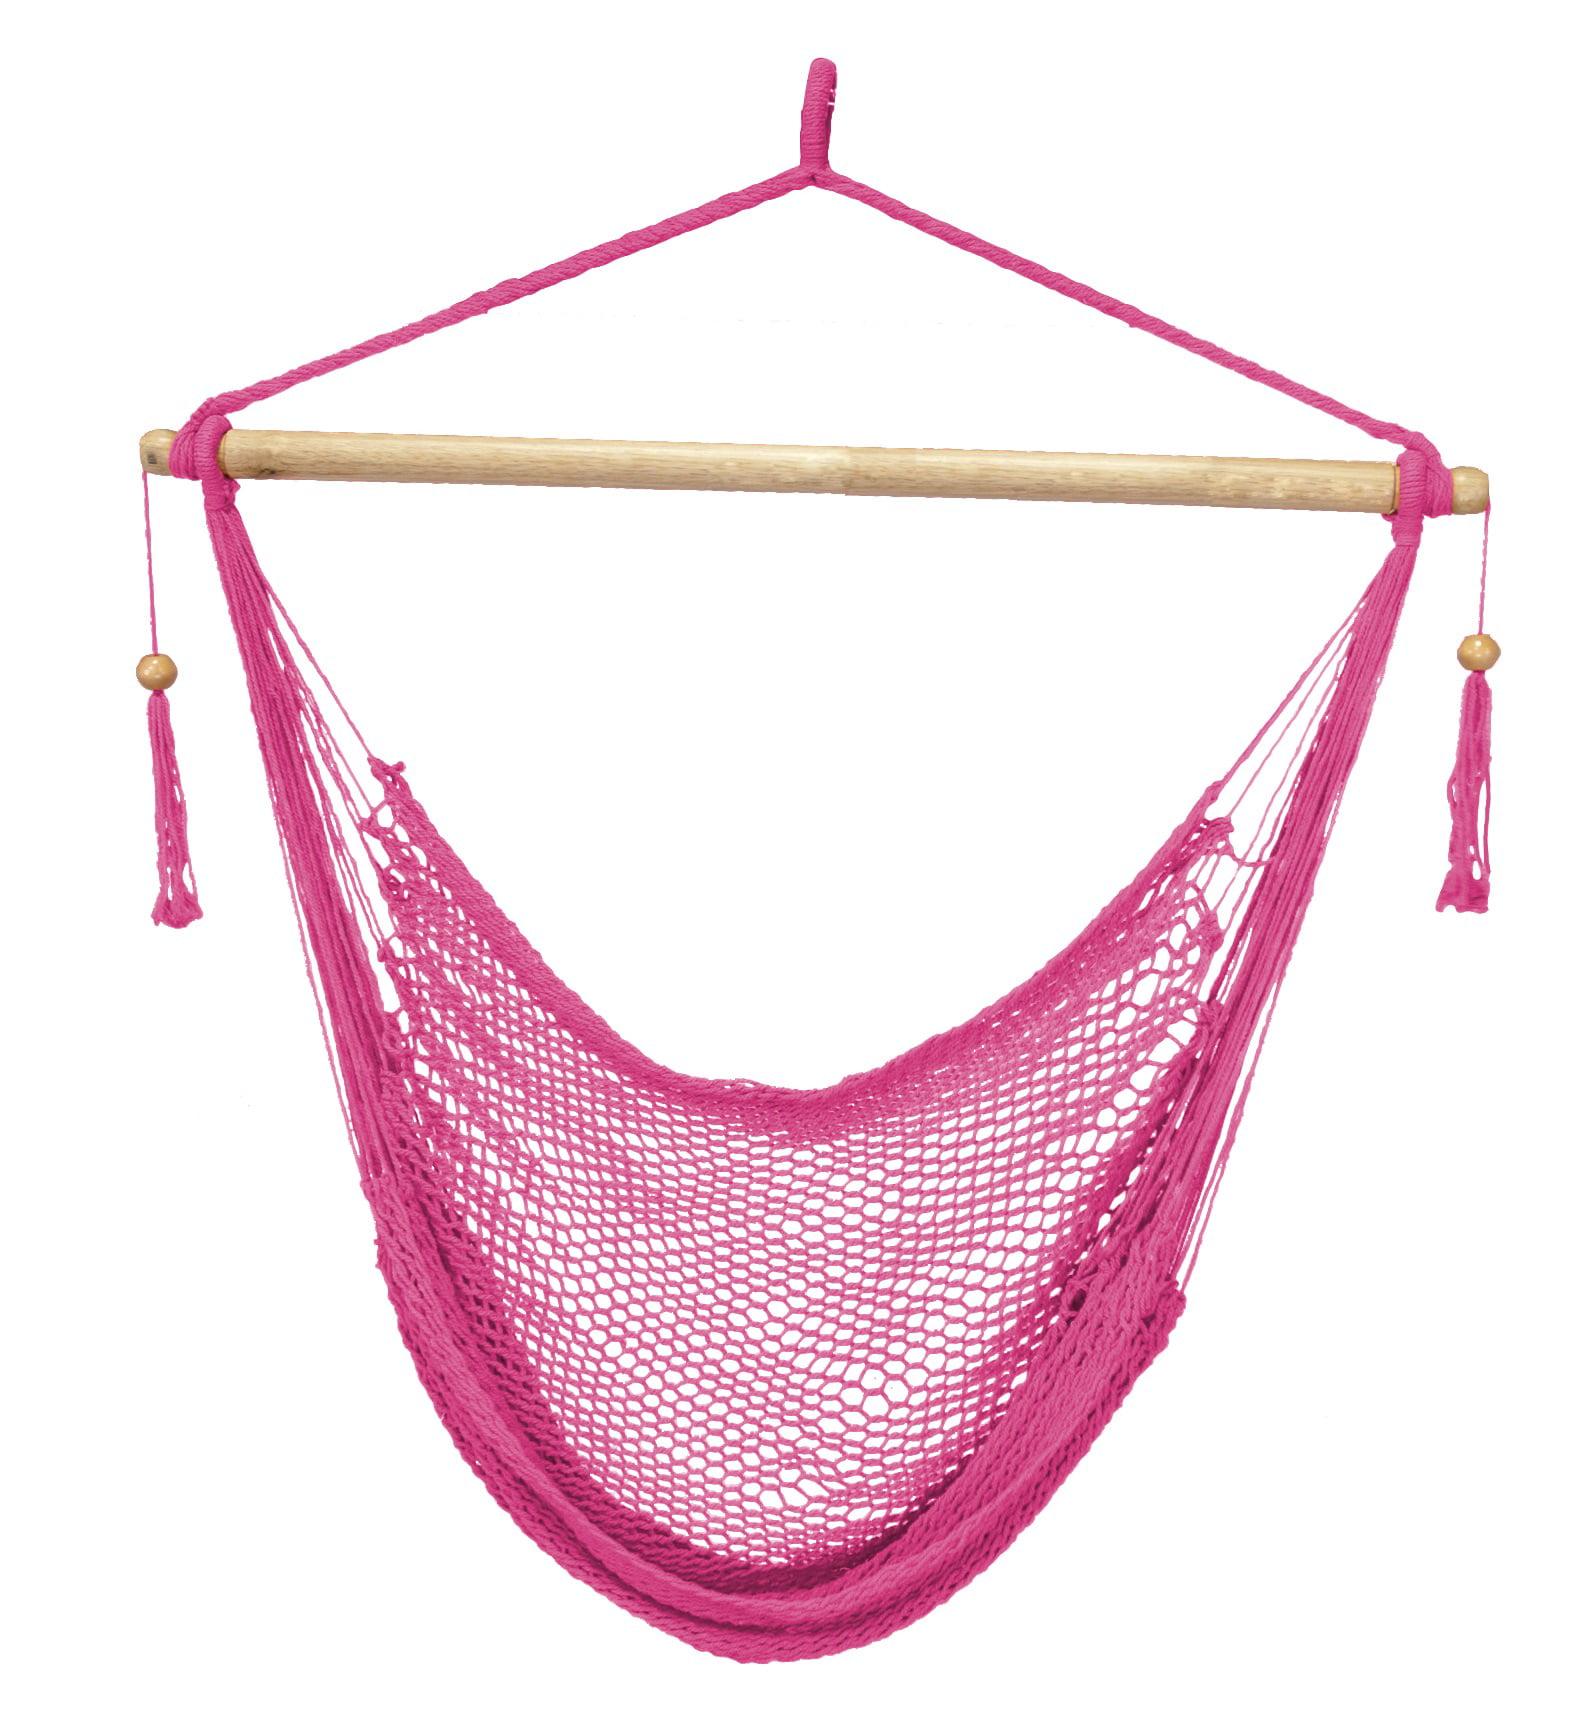 Island Paradise Rope Hammock Chair - Pink